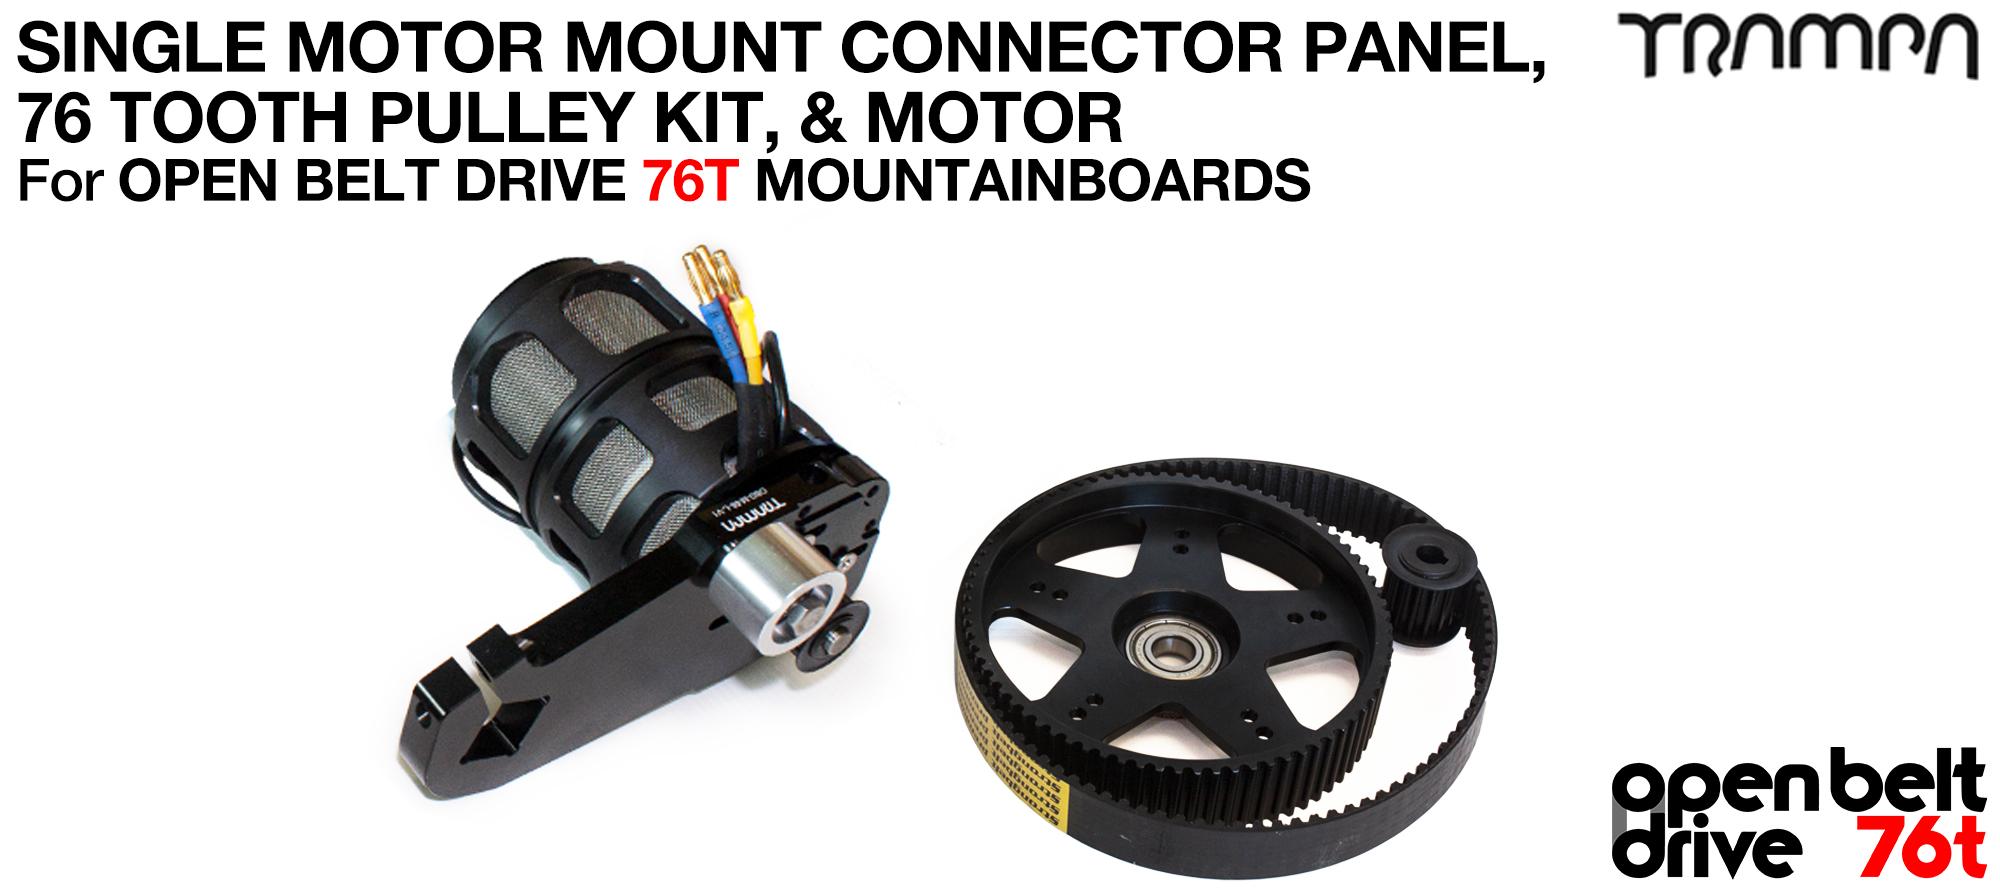 76T OPEN BELT DRIVE Motor Mount & 76T Pulley Kit with MOTOR & Filters - SINGLE